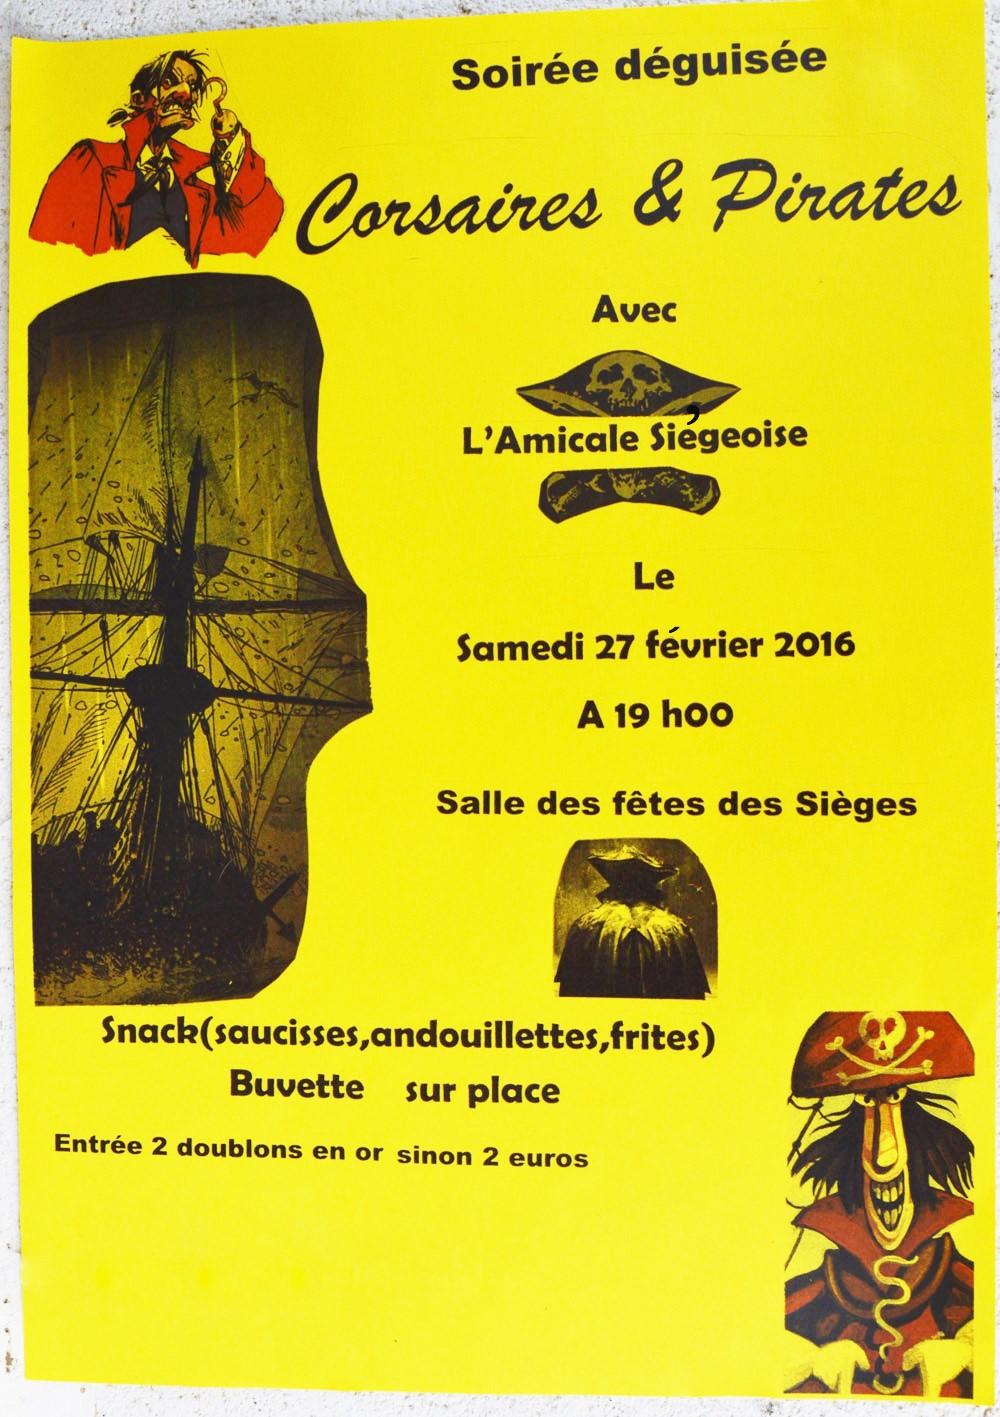 Corsaires et Pirates 2016